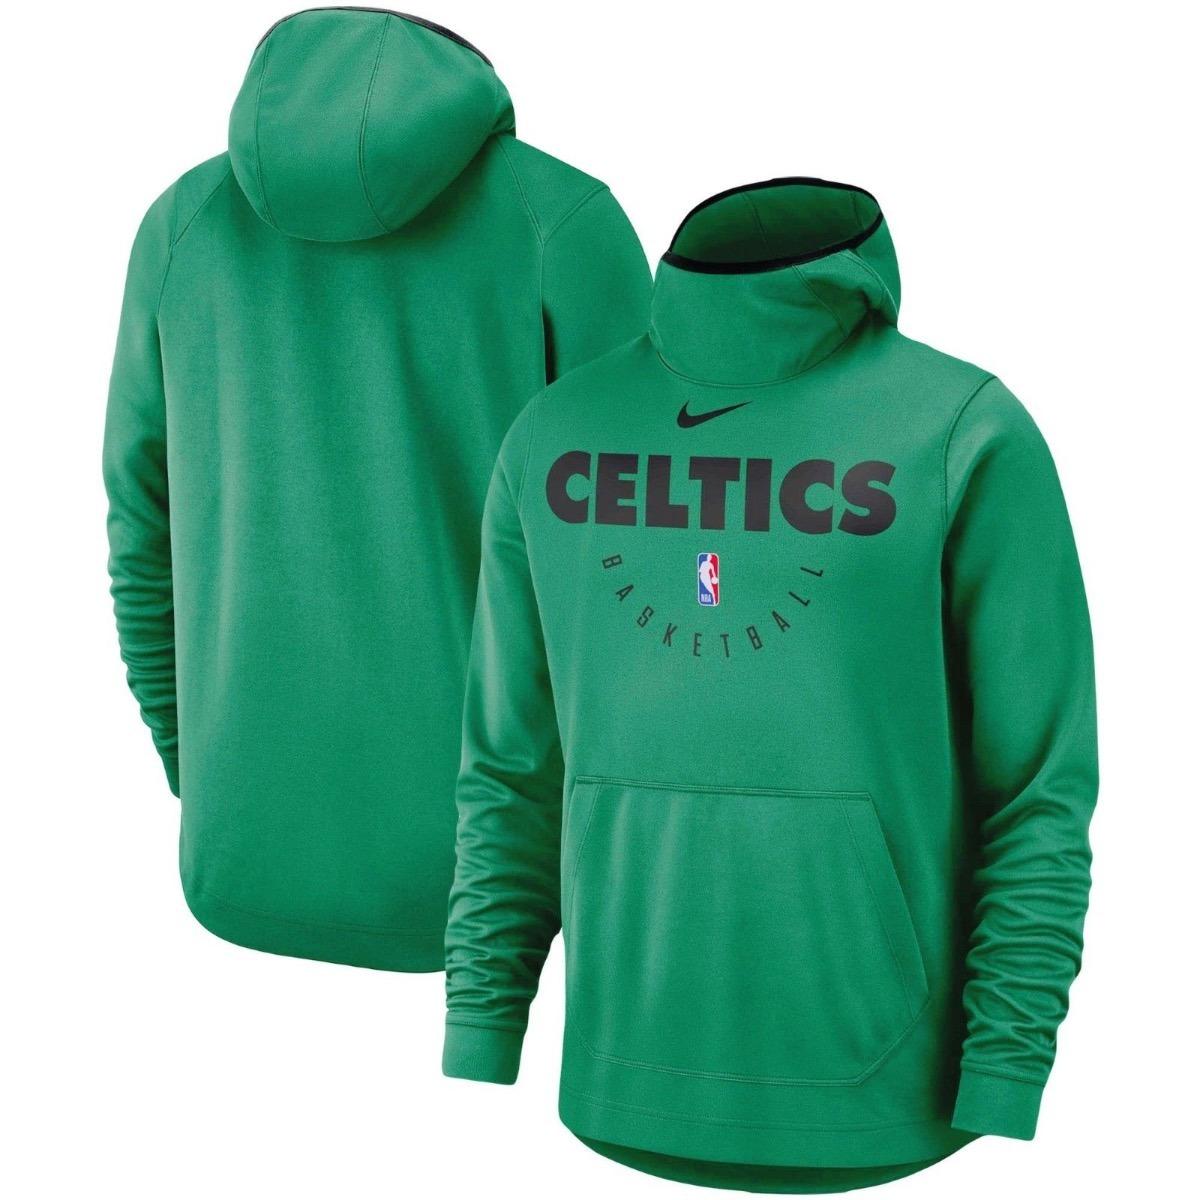 Boston Nike Original Celtics Nba Kyrie Sudadera Irving 2019 S1wPqBHx